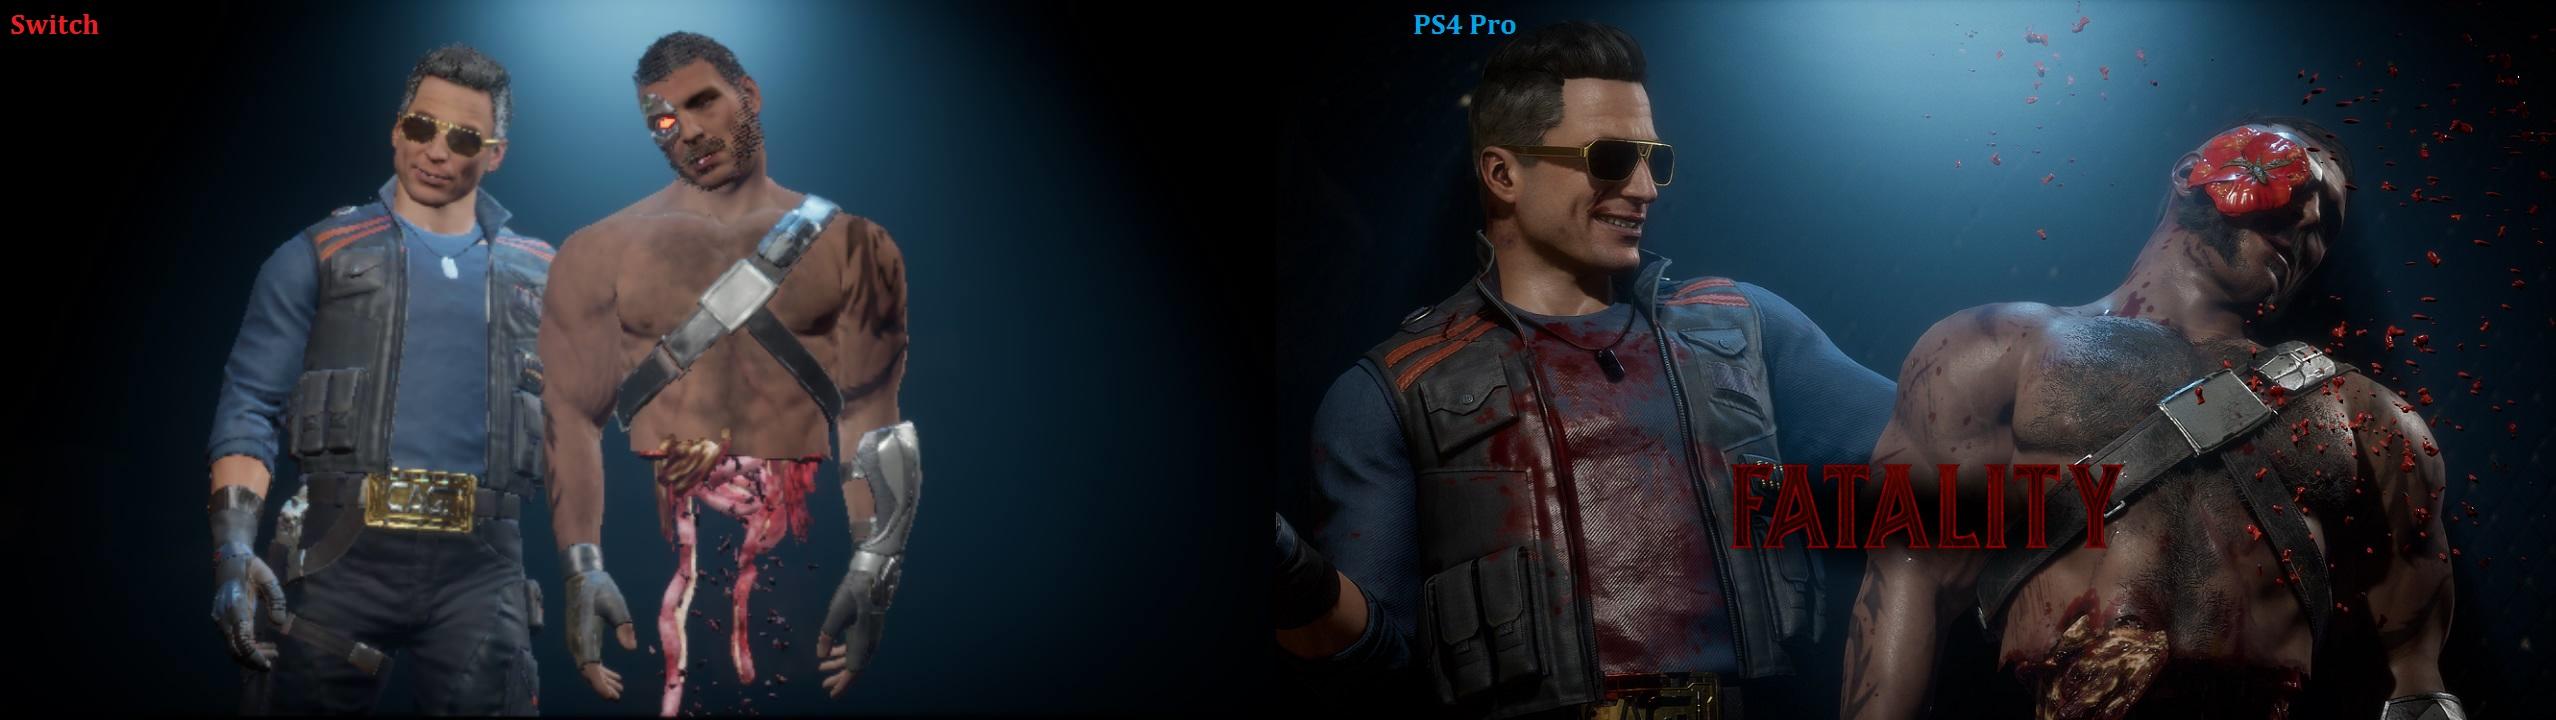 Switch vs PS4 Pro - Mortal Kombat 11